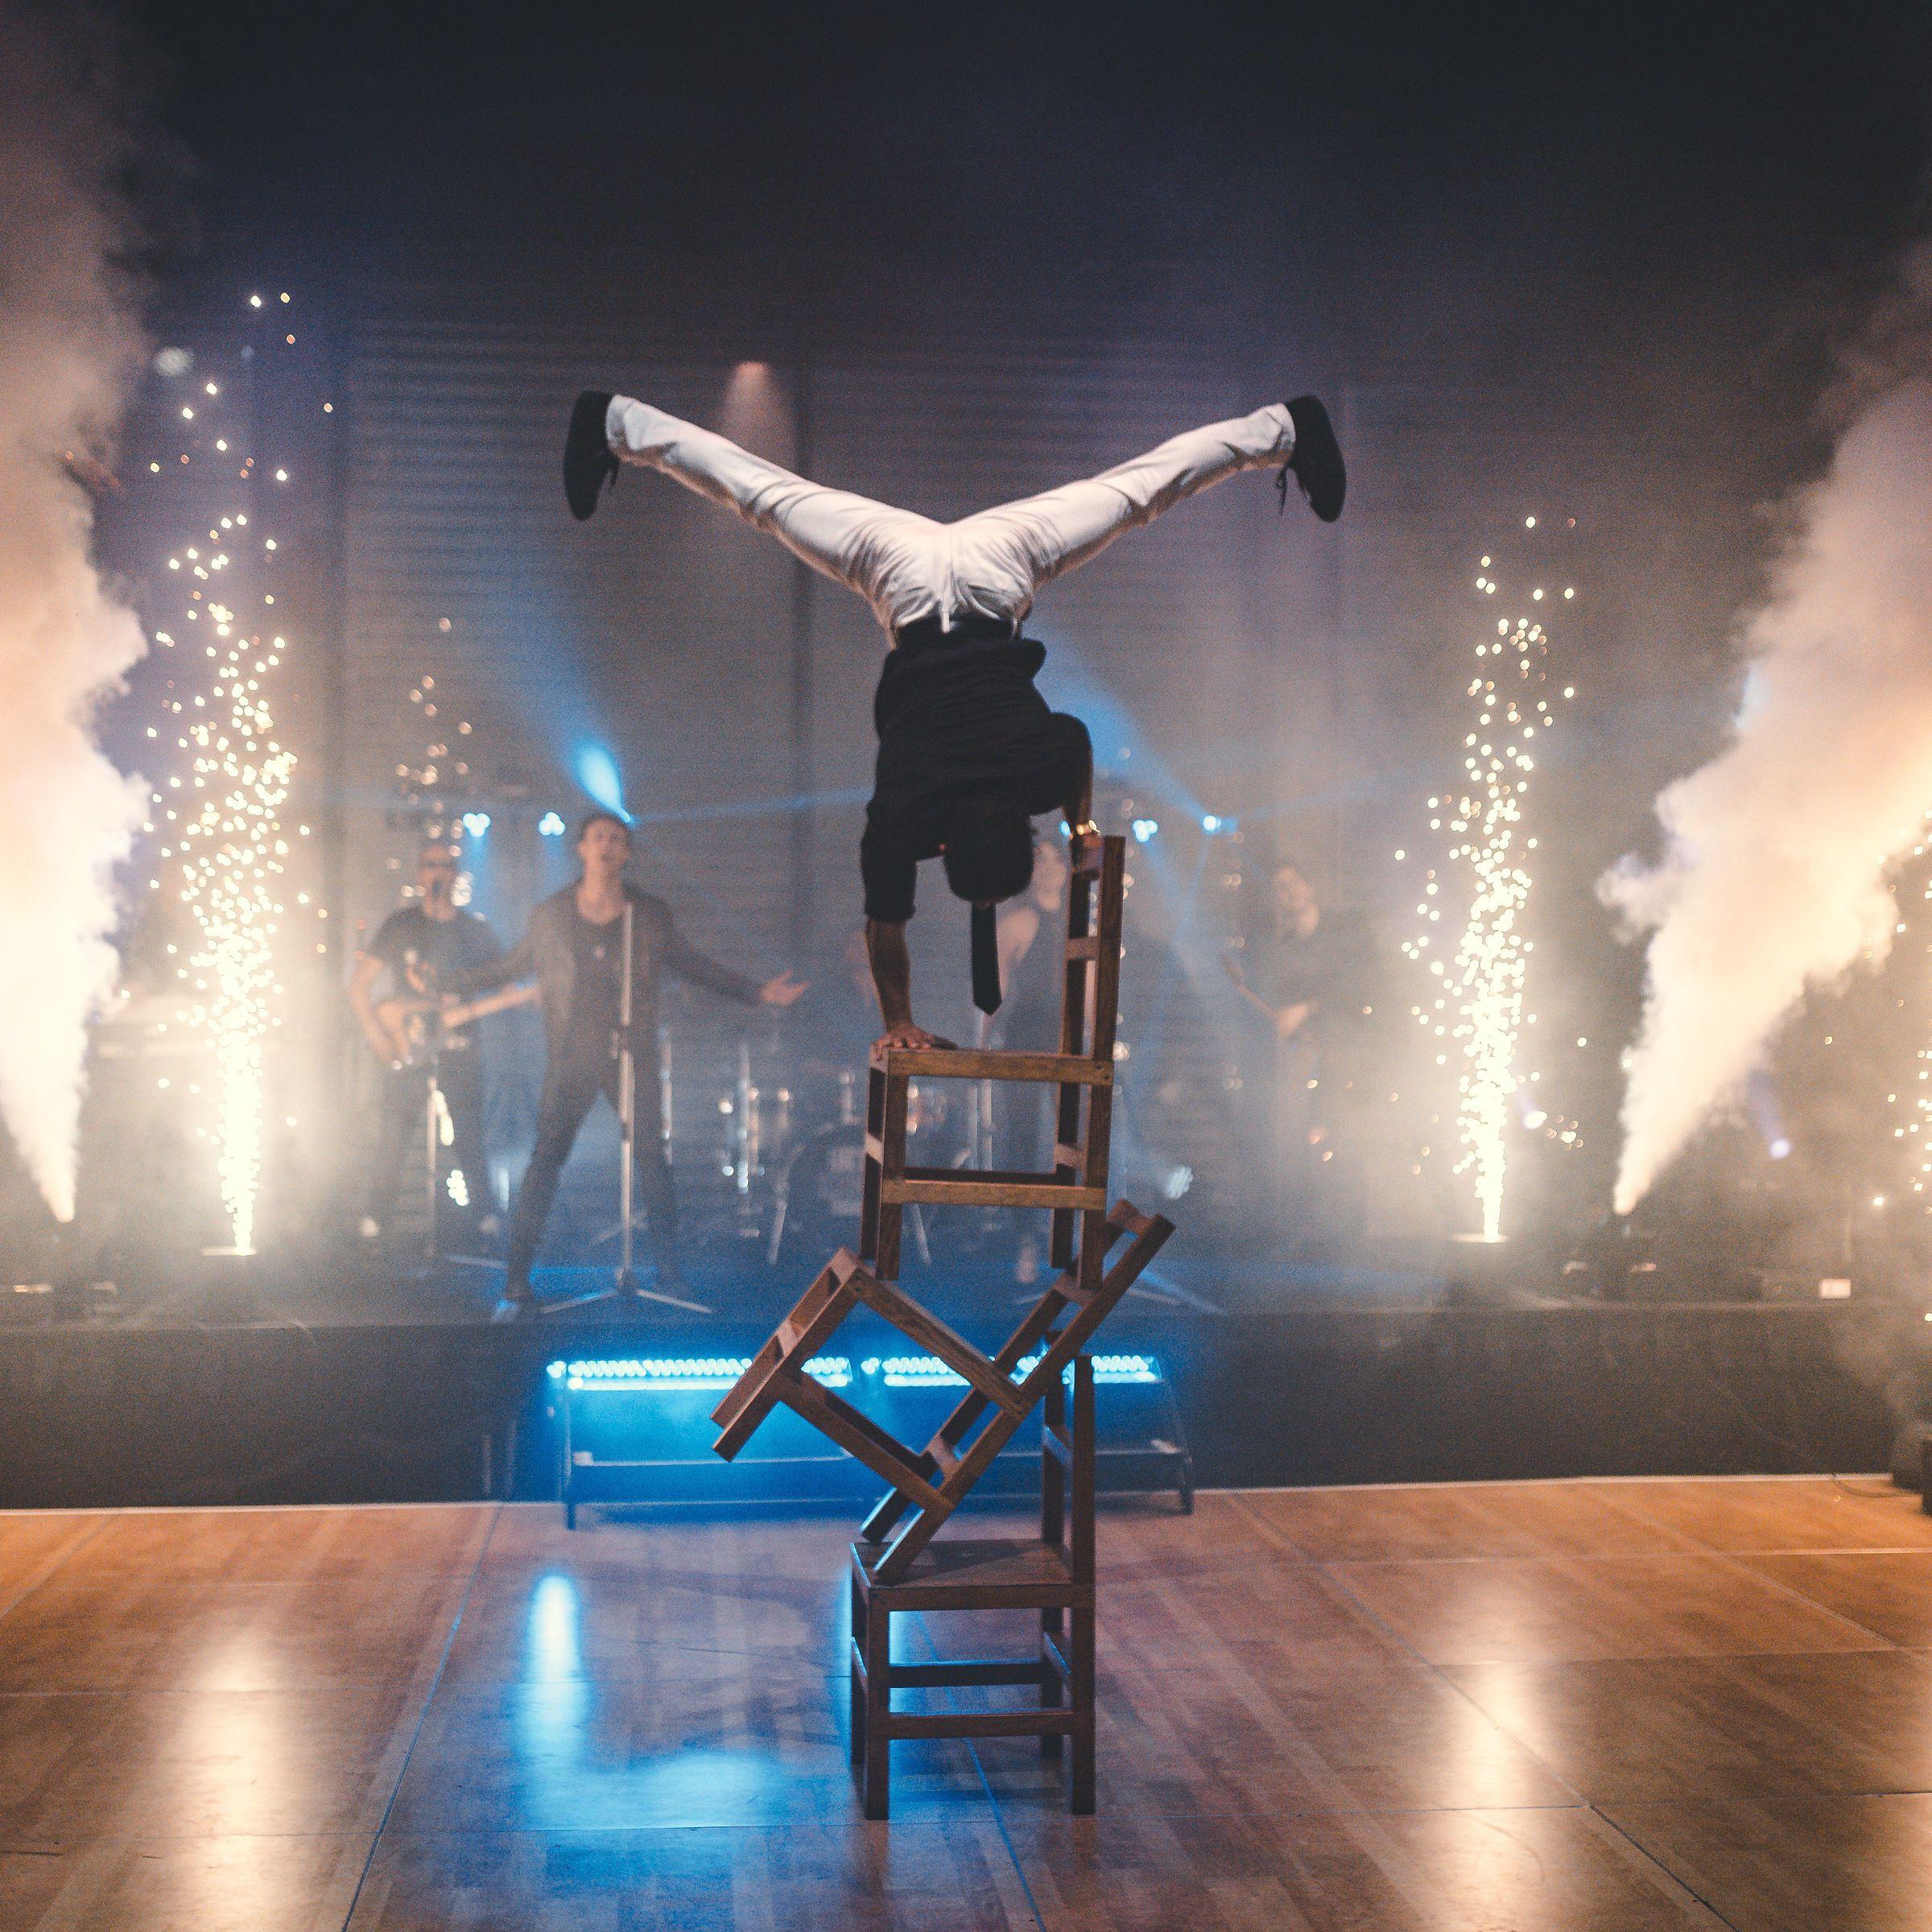 Acrobat Chair Stunts